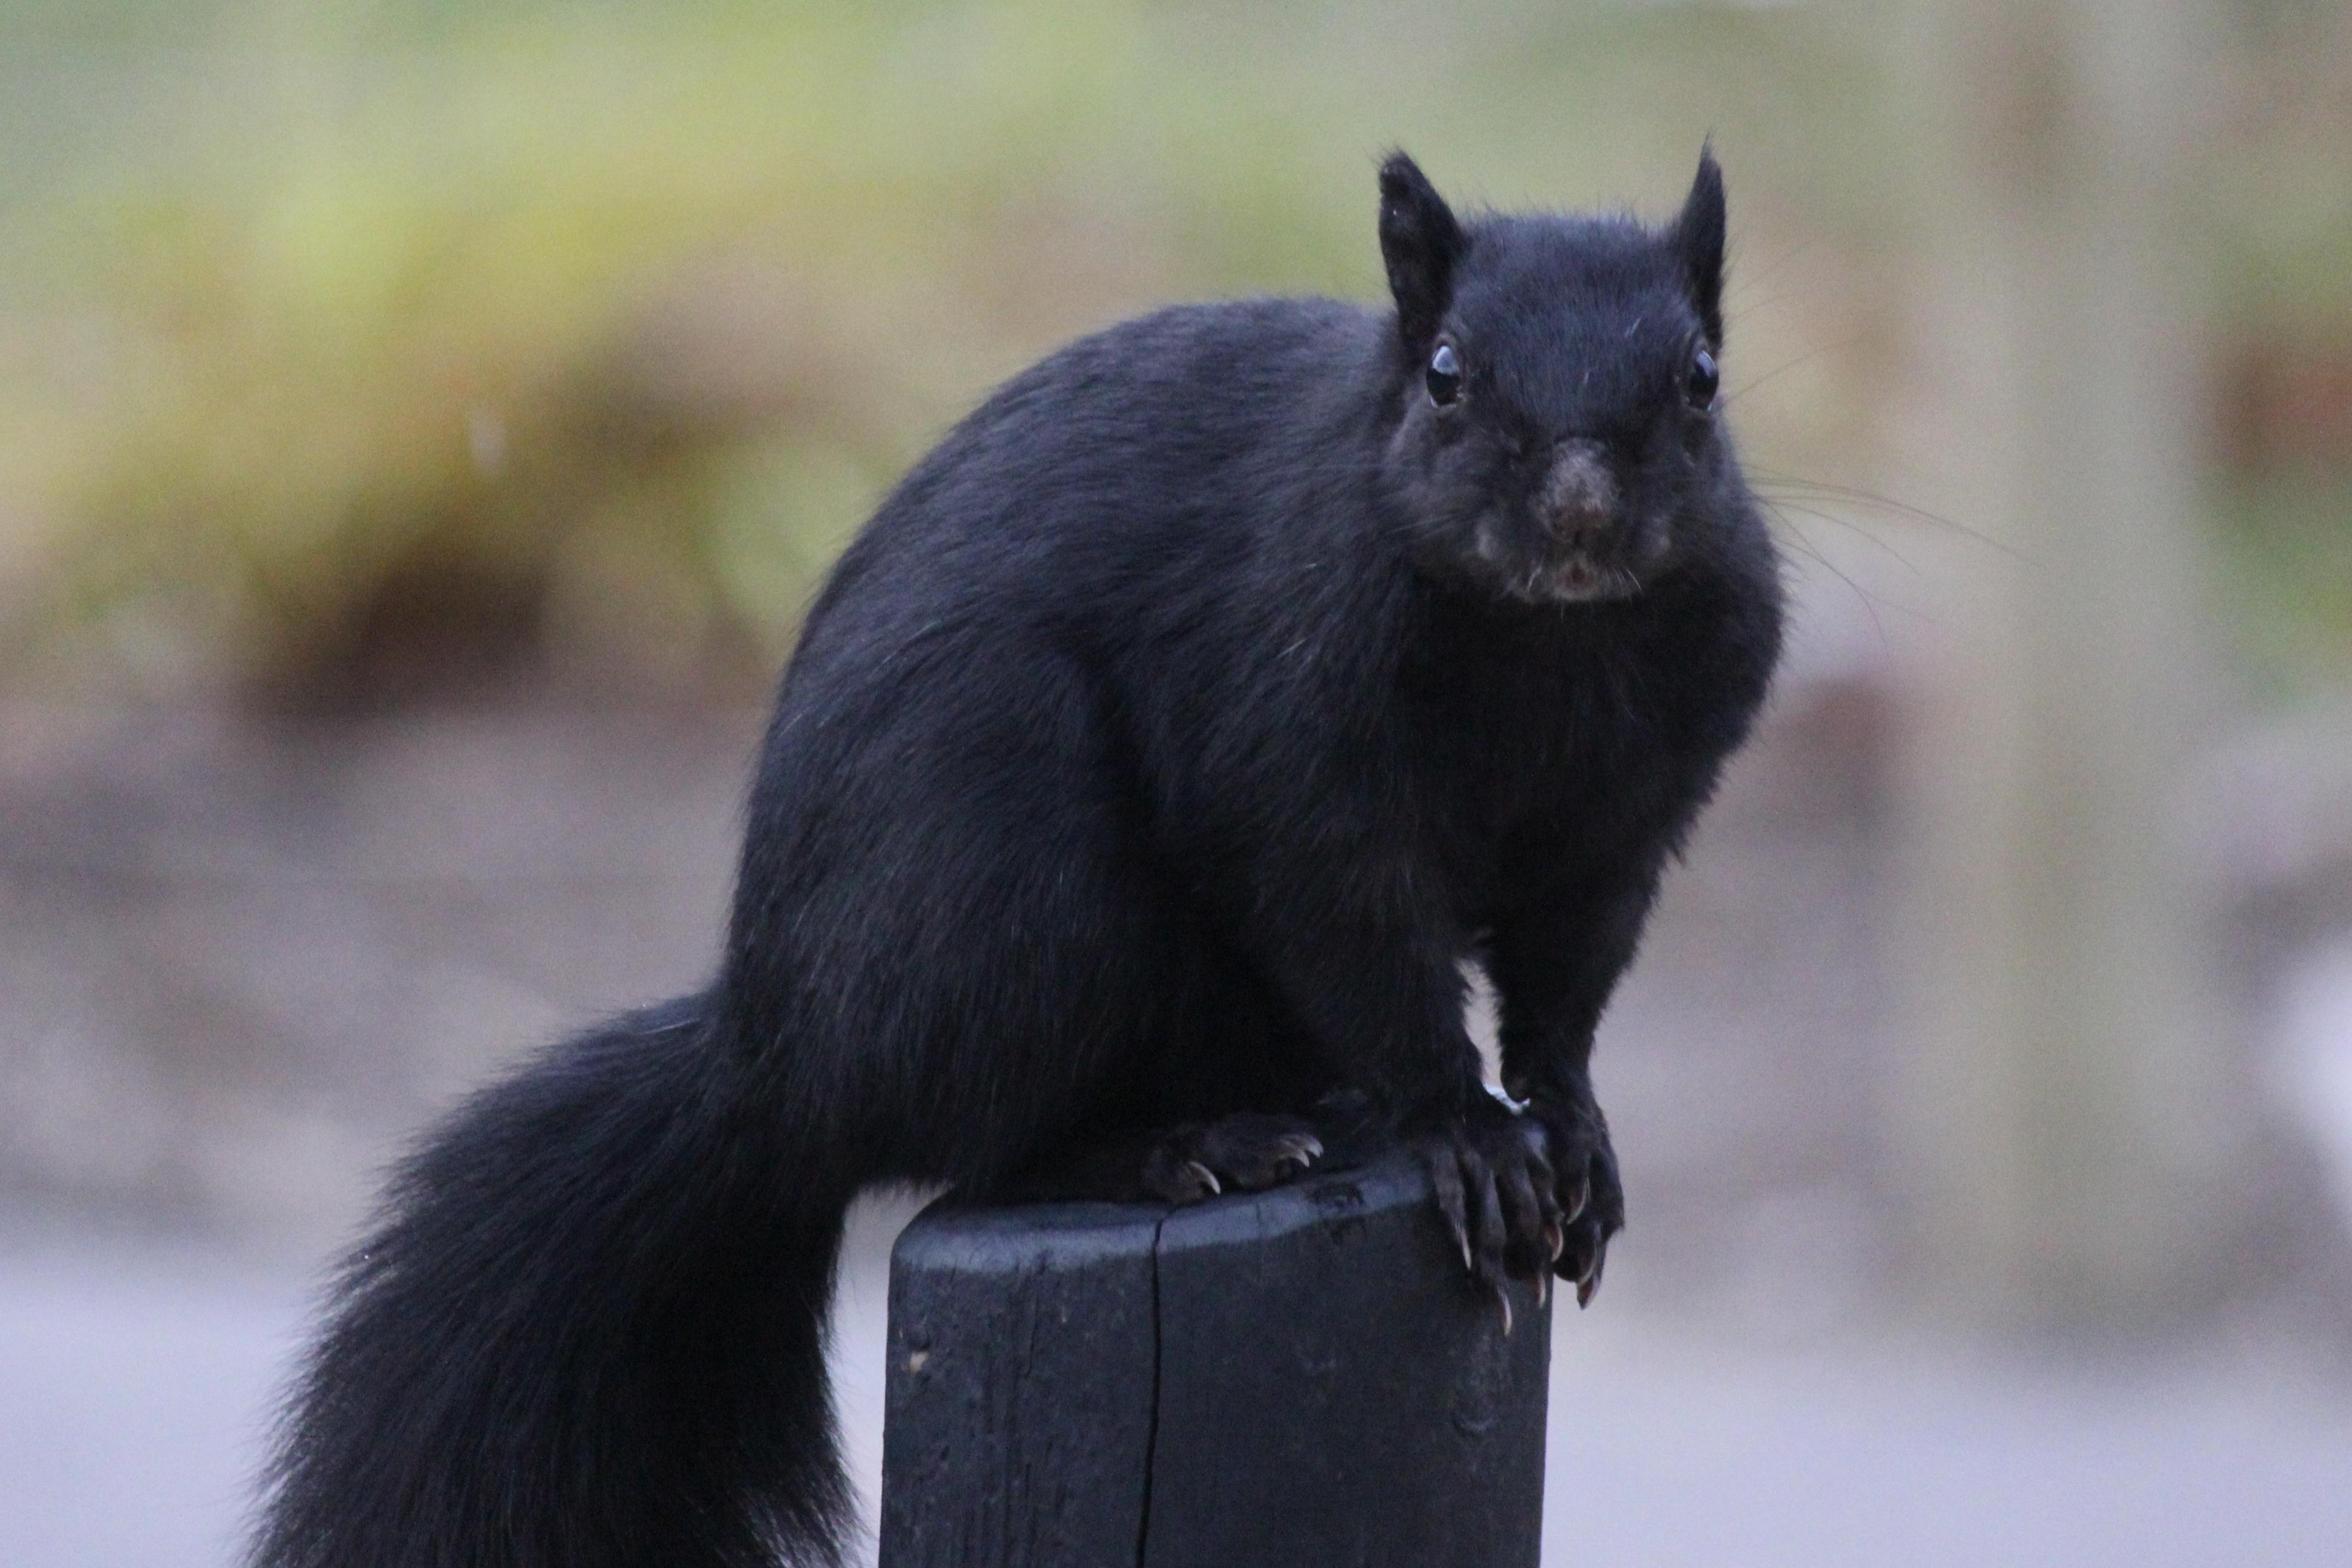 Black Squirrel Wikipedia Versity R16 Red Near Michigan State University In East Lansing